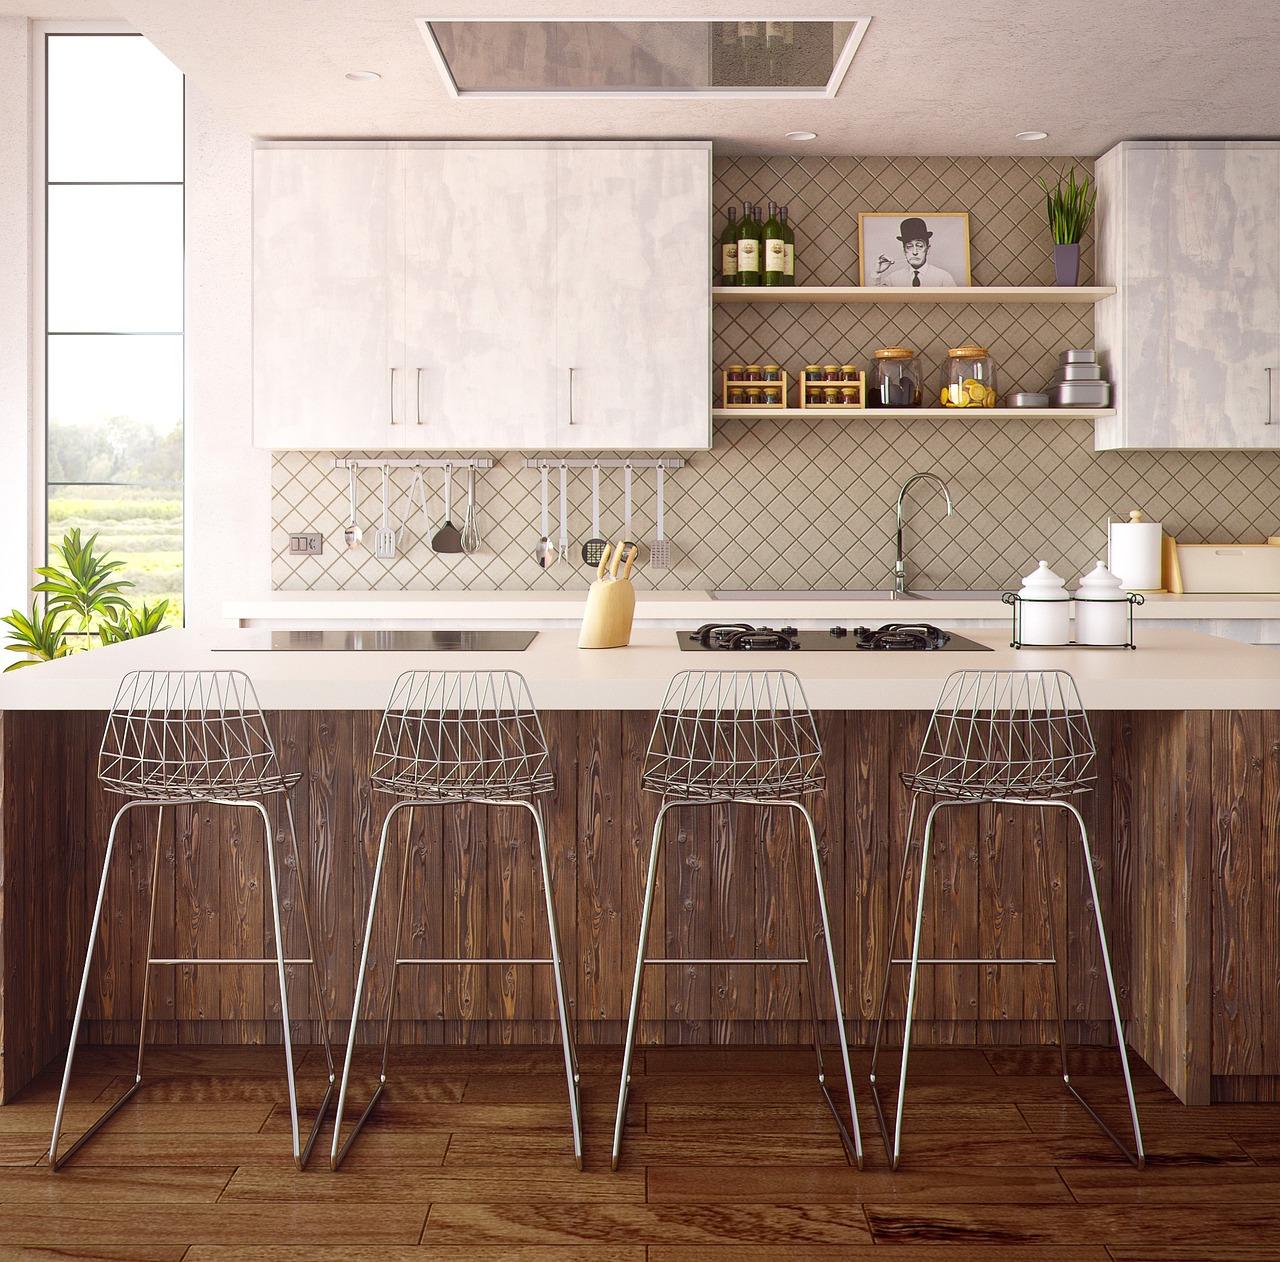 izlietnes un mebeles virtuvei